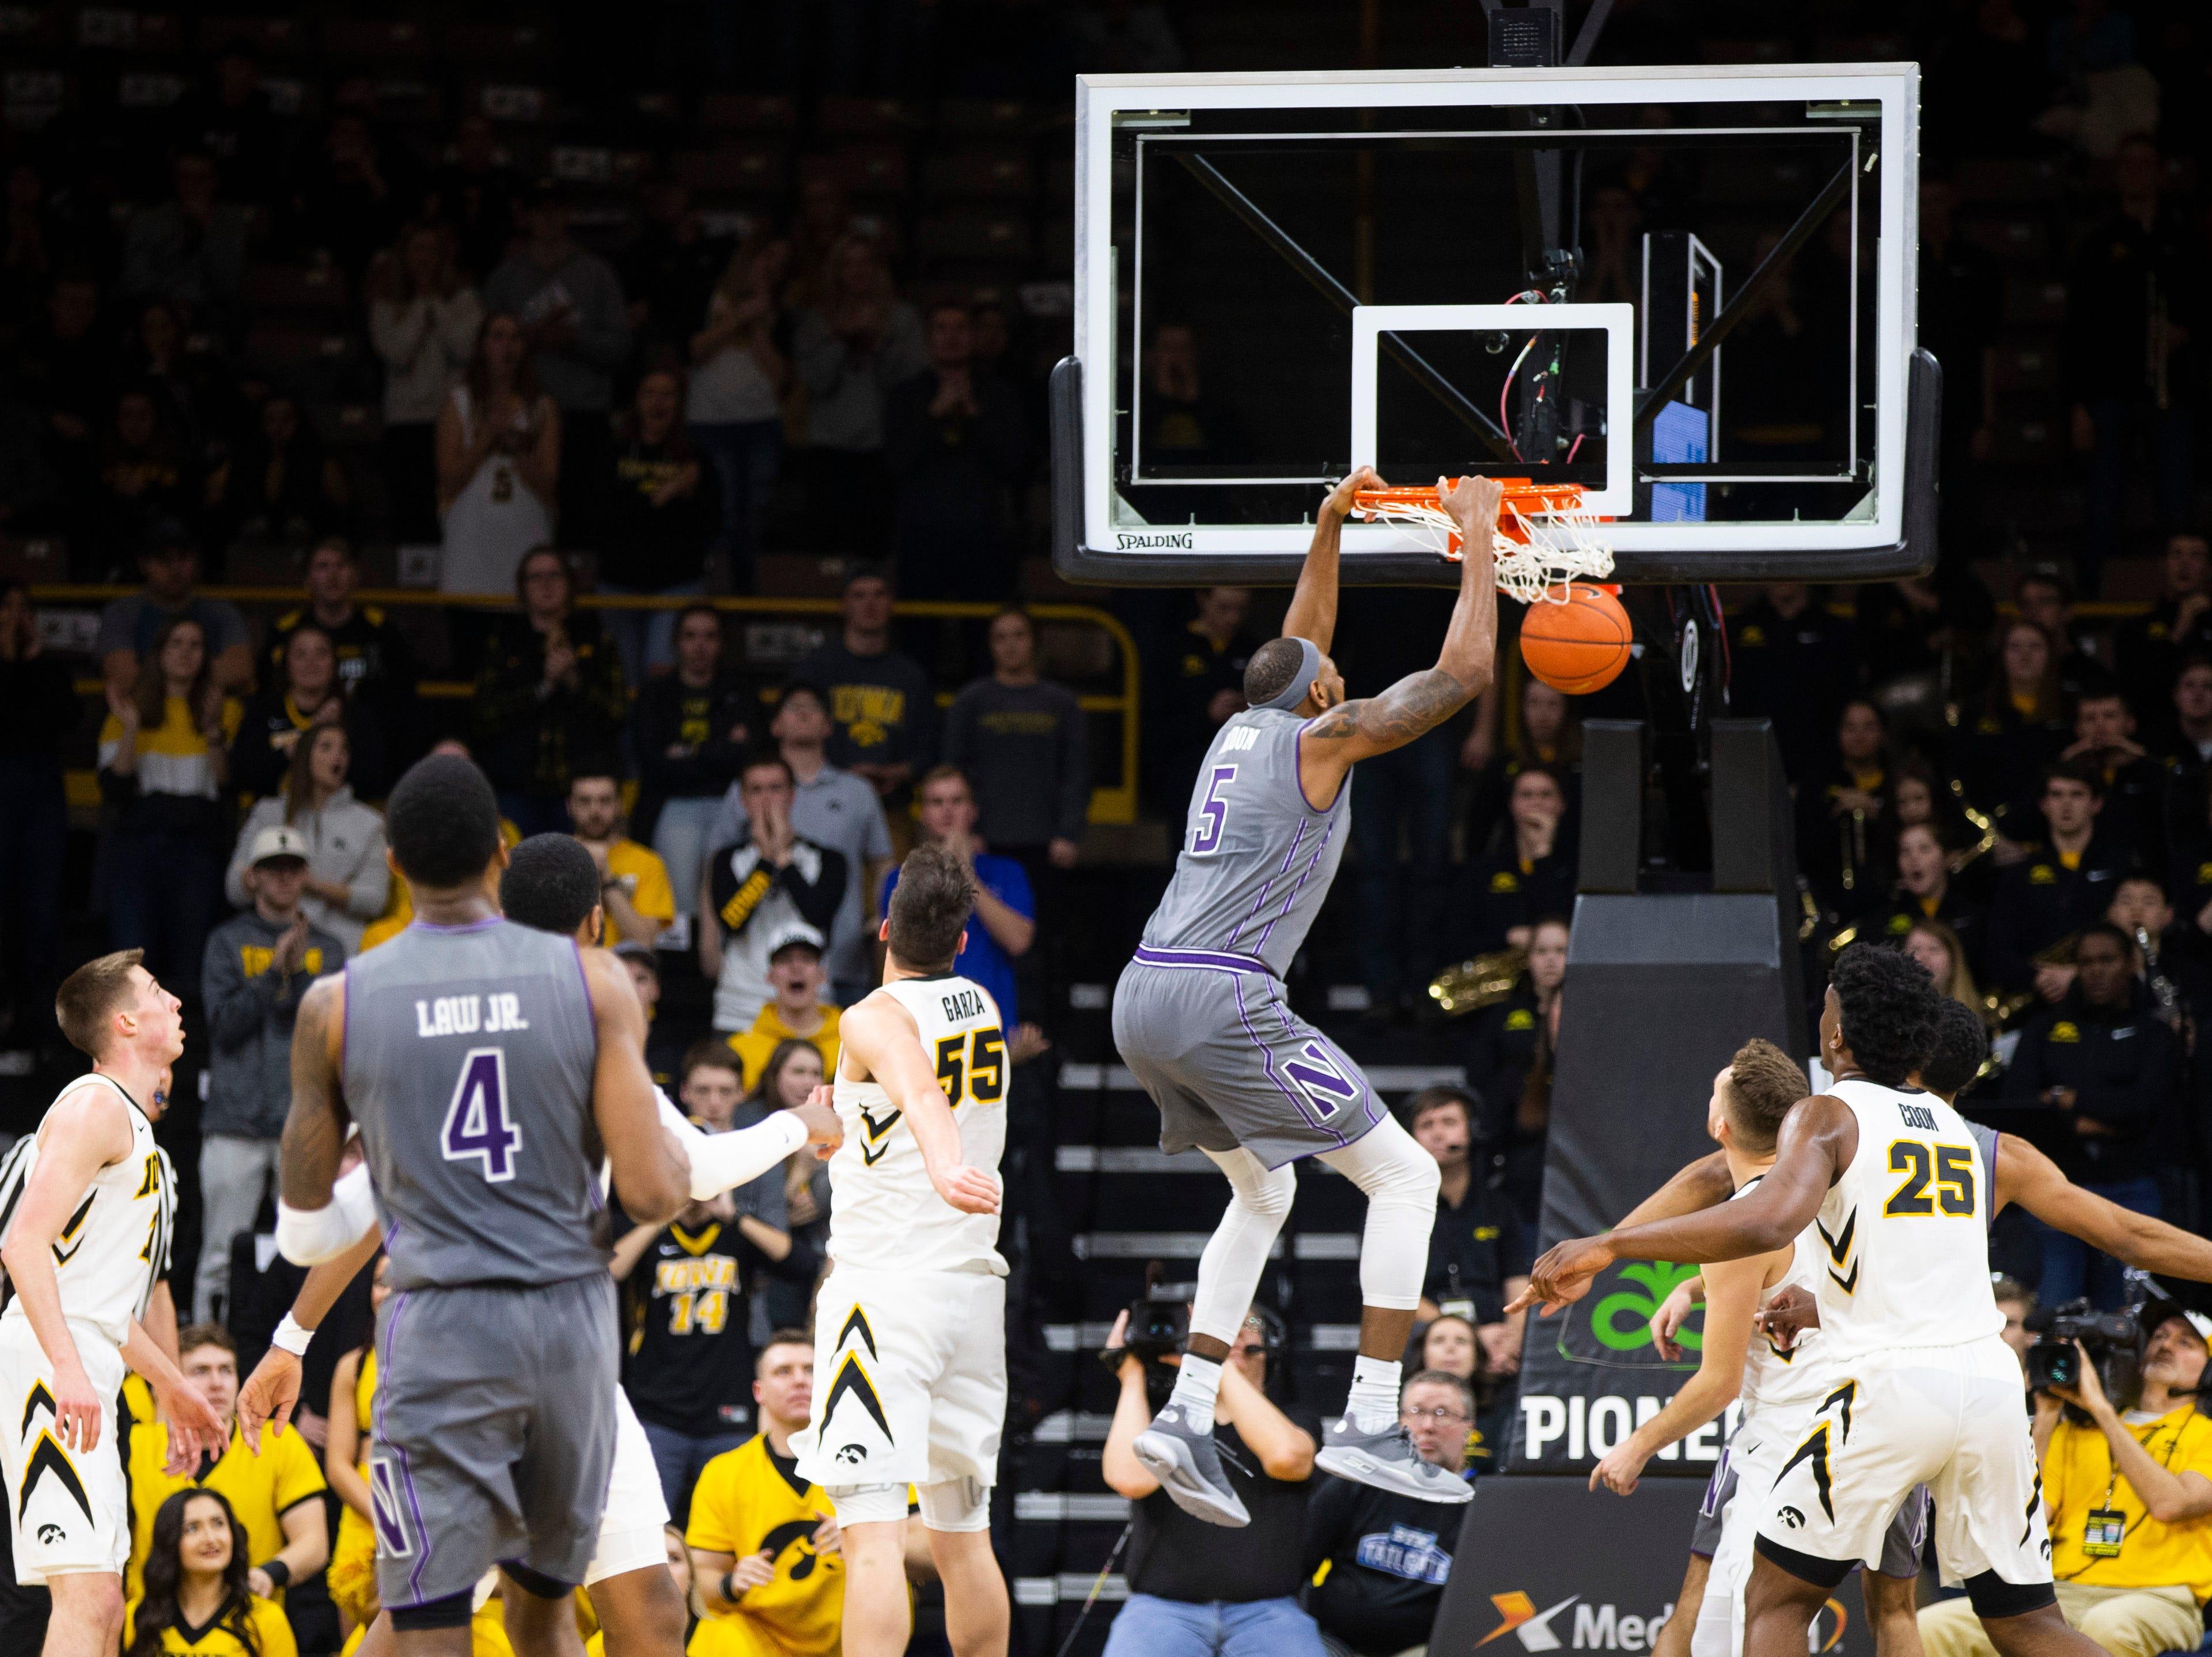 Northwestern center Dererk Pardon (5) dunks during a NCAA Big Ten Conference men's basketball game on Sunday, Feb. 10, 2019 at Carver-Hawkeye Arena in Iowa City, Iowa.